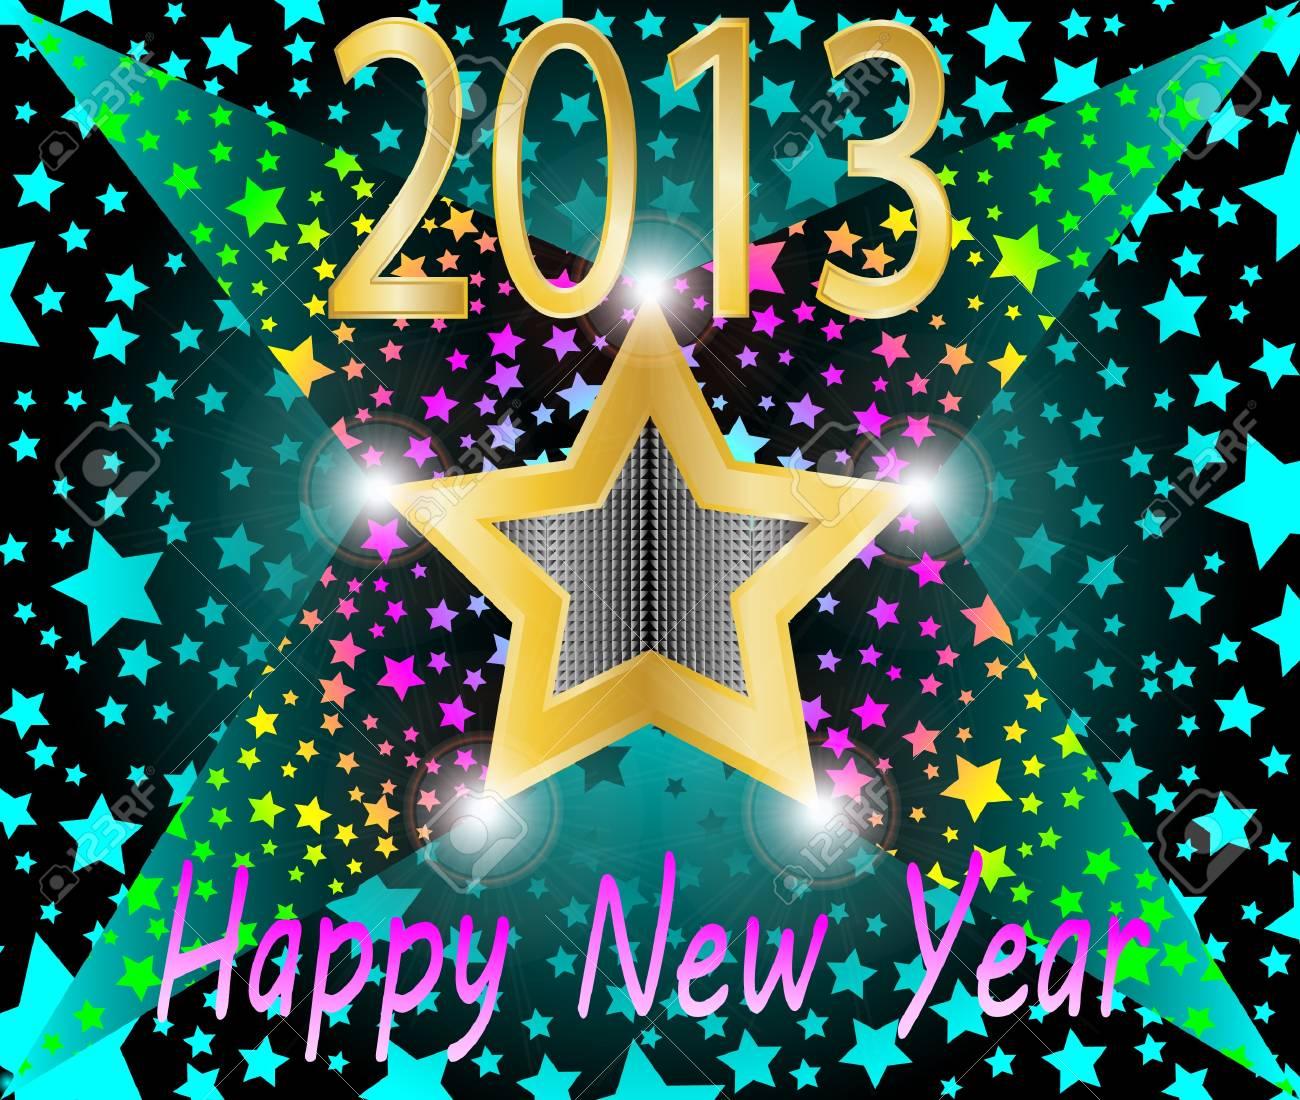 Happy new year 2013 vector illustration Stock Vector - 16123114